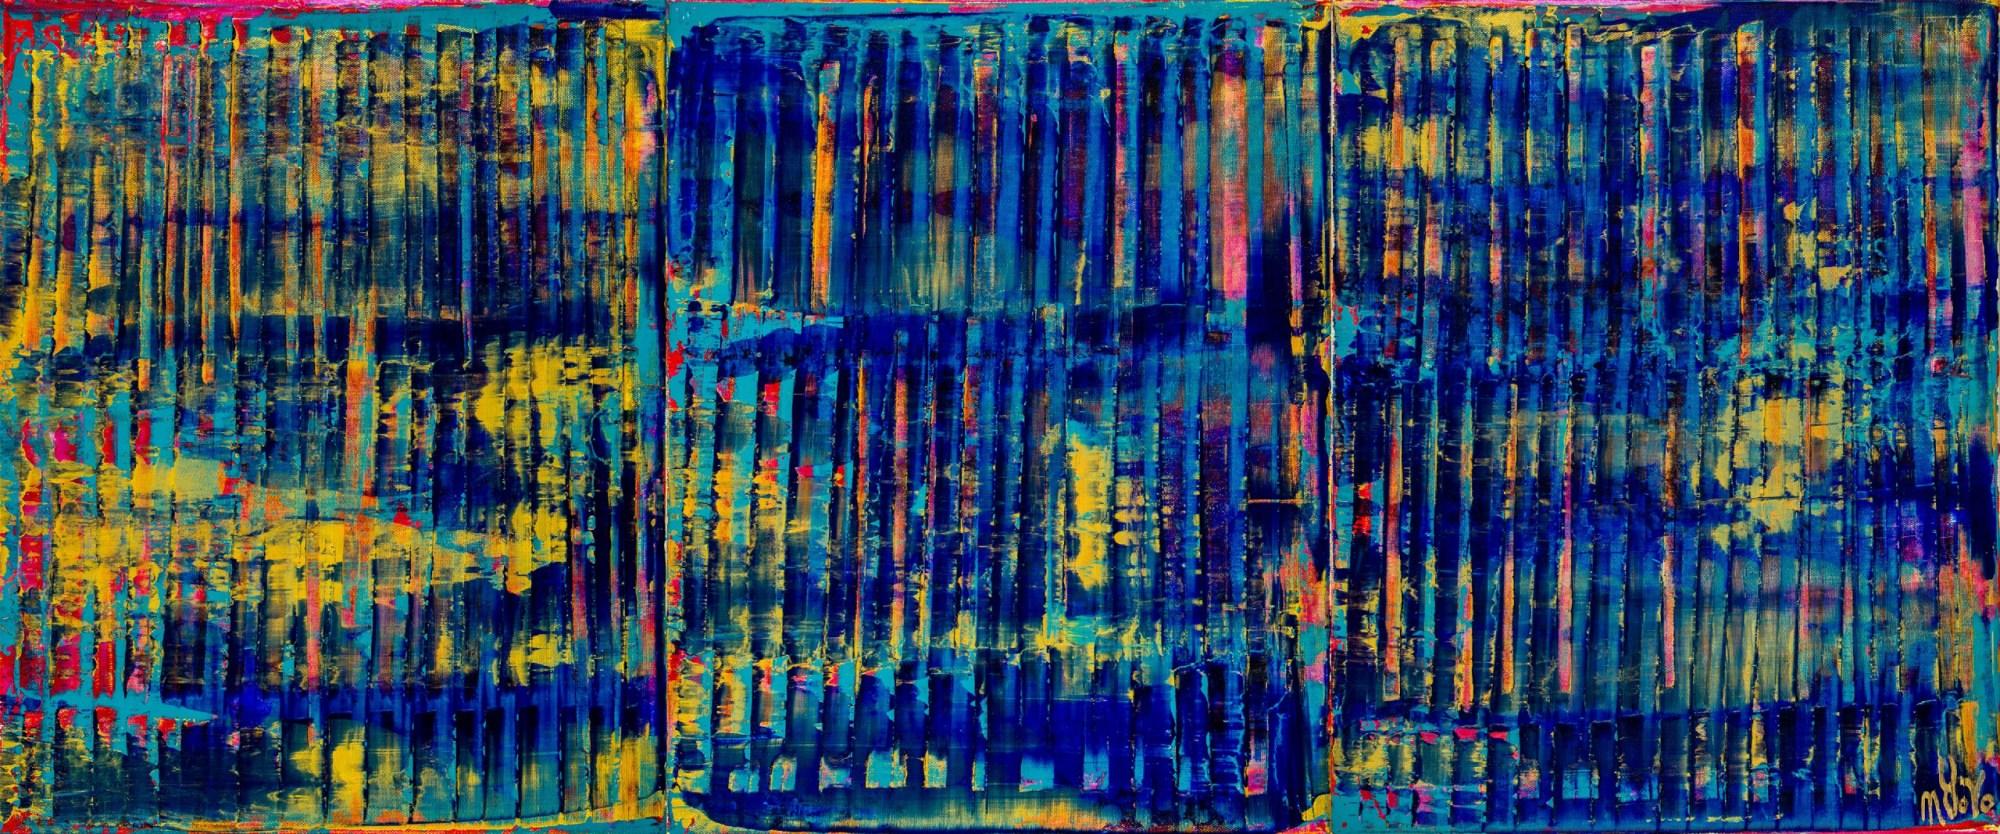 Breeze Intrusion (Gold Cracks) 2020 / Triptych by Nestor Toro